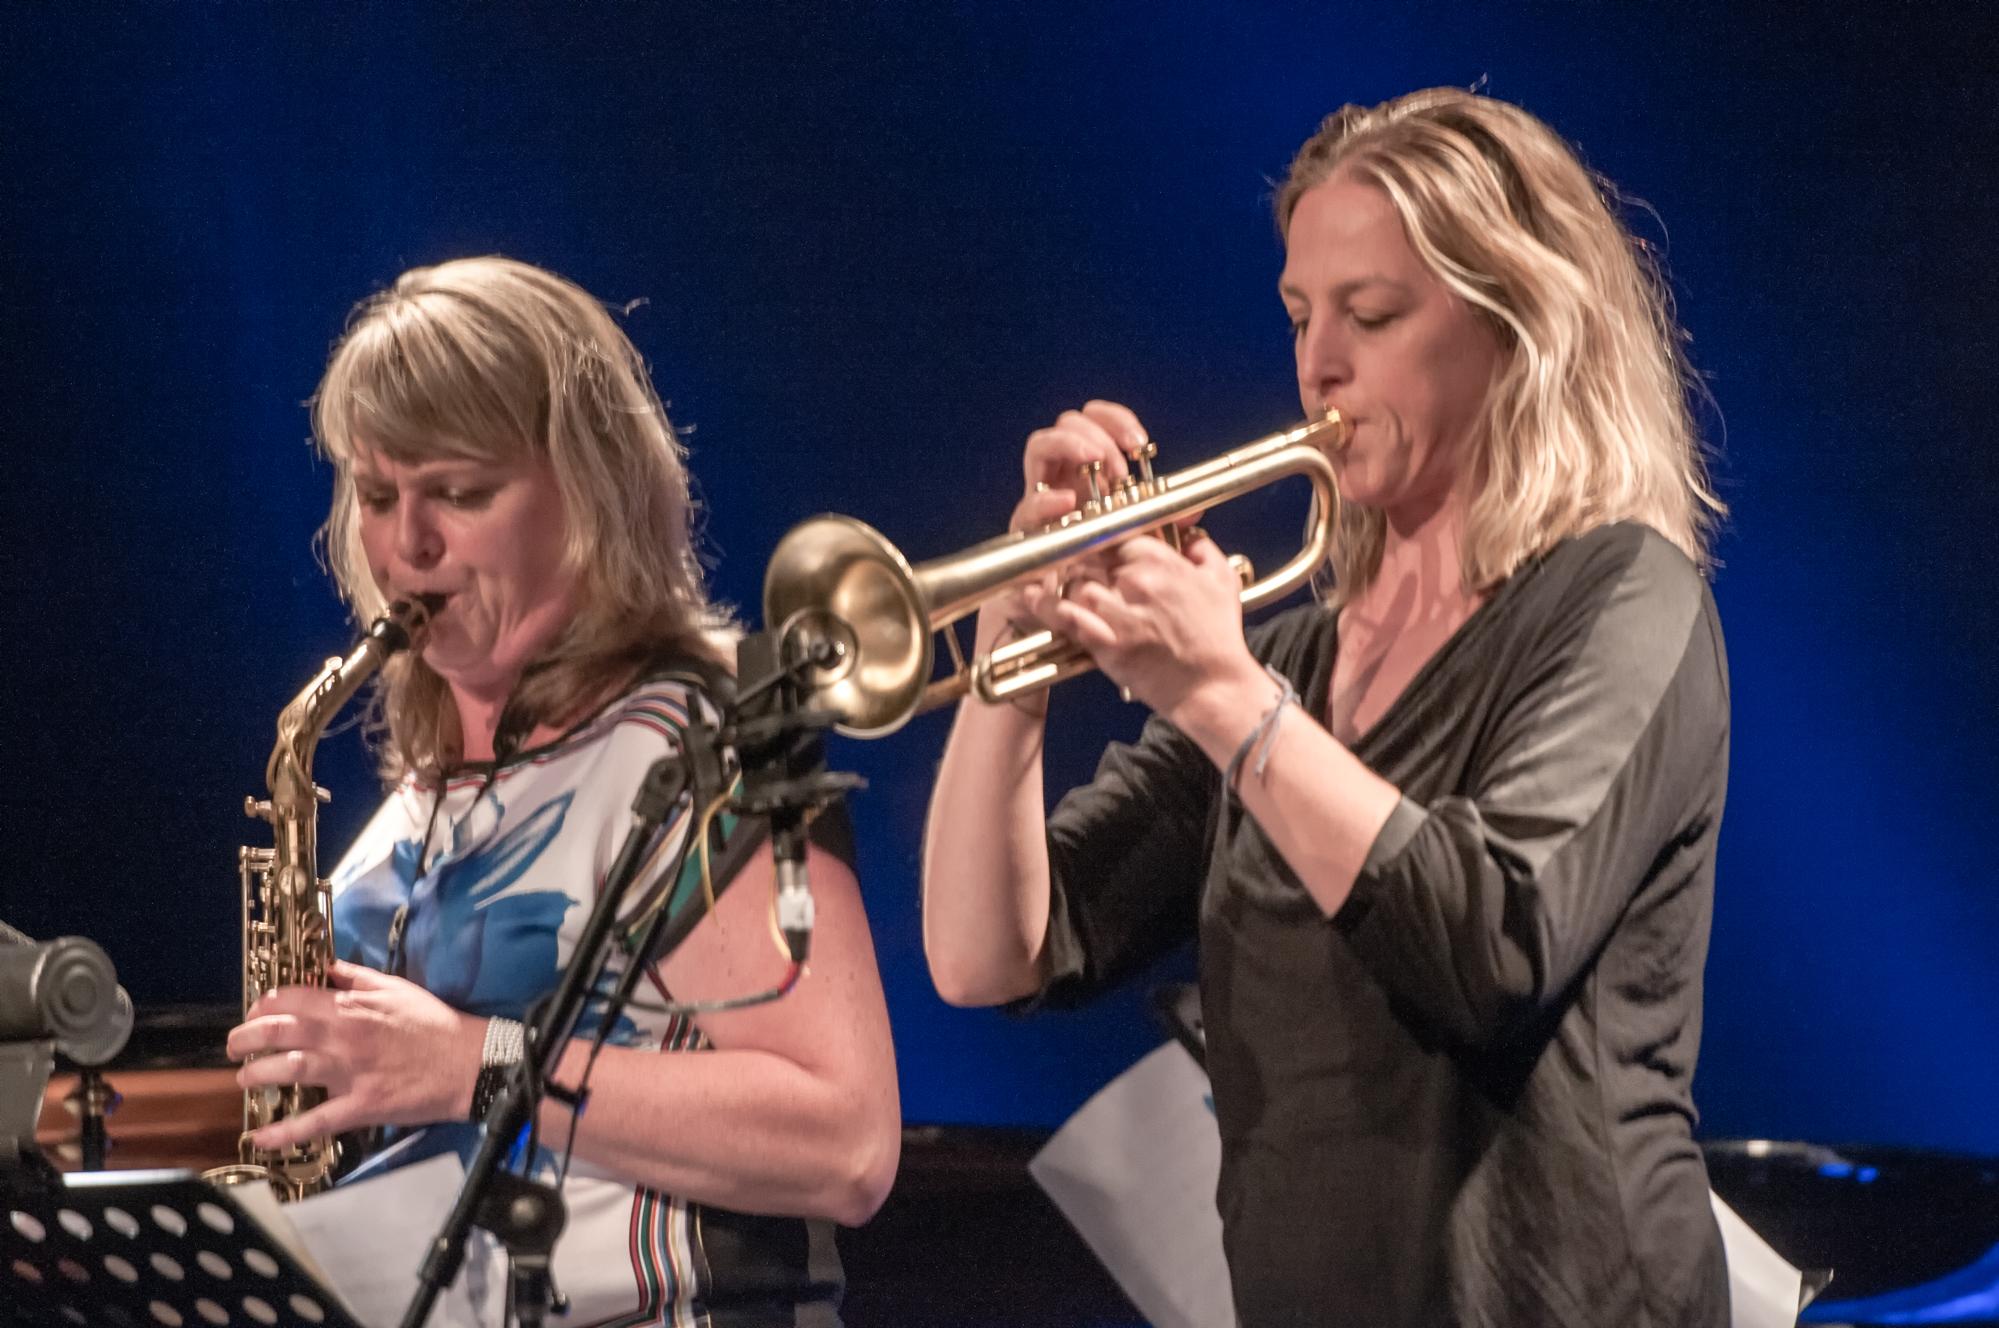 Christine jensen and ingrid jensen at the montreal international jazz festival 2013